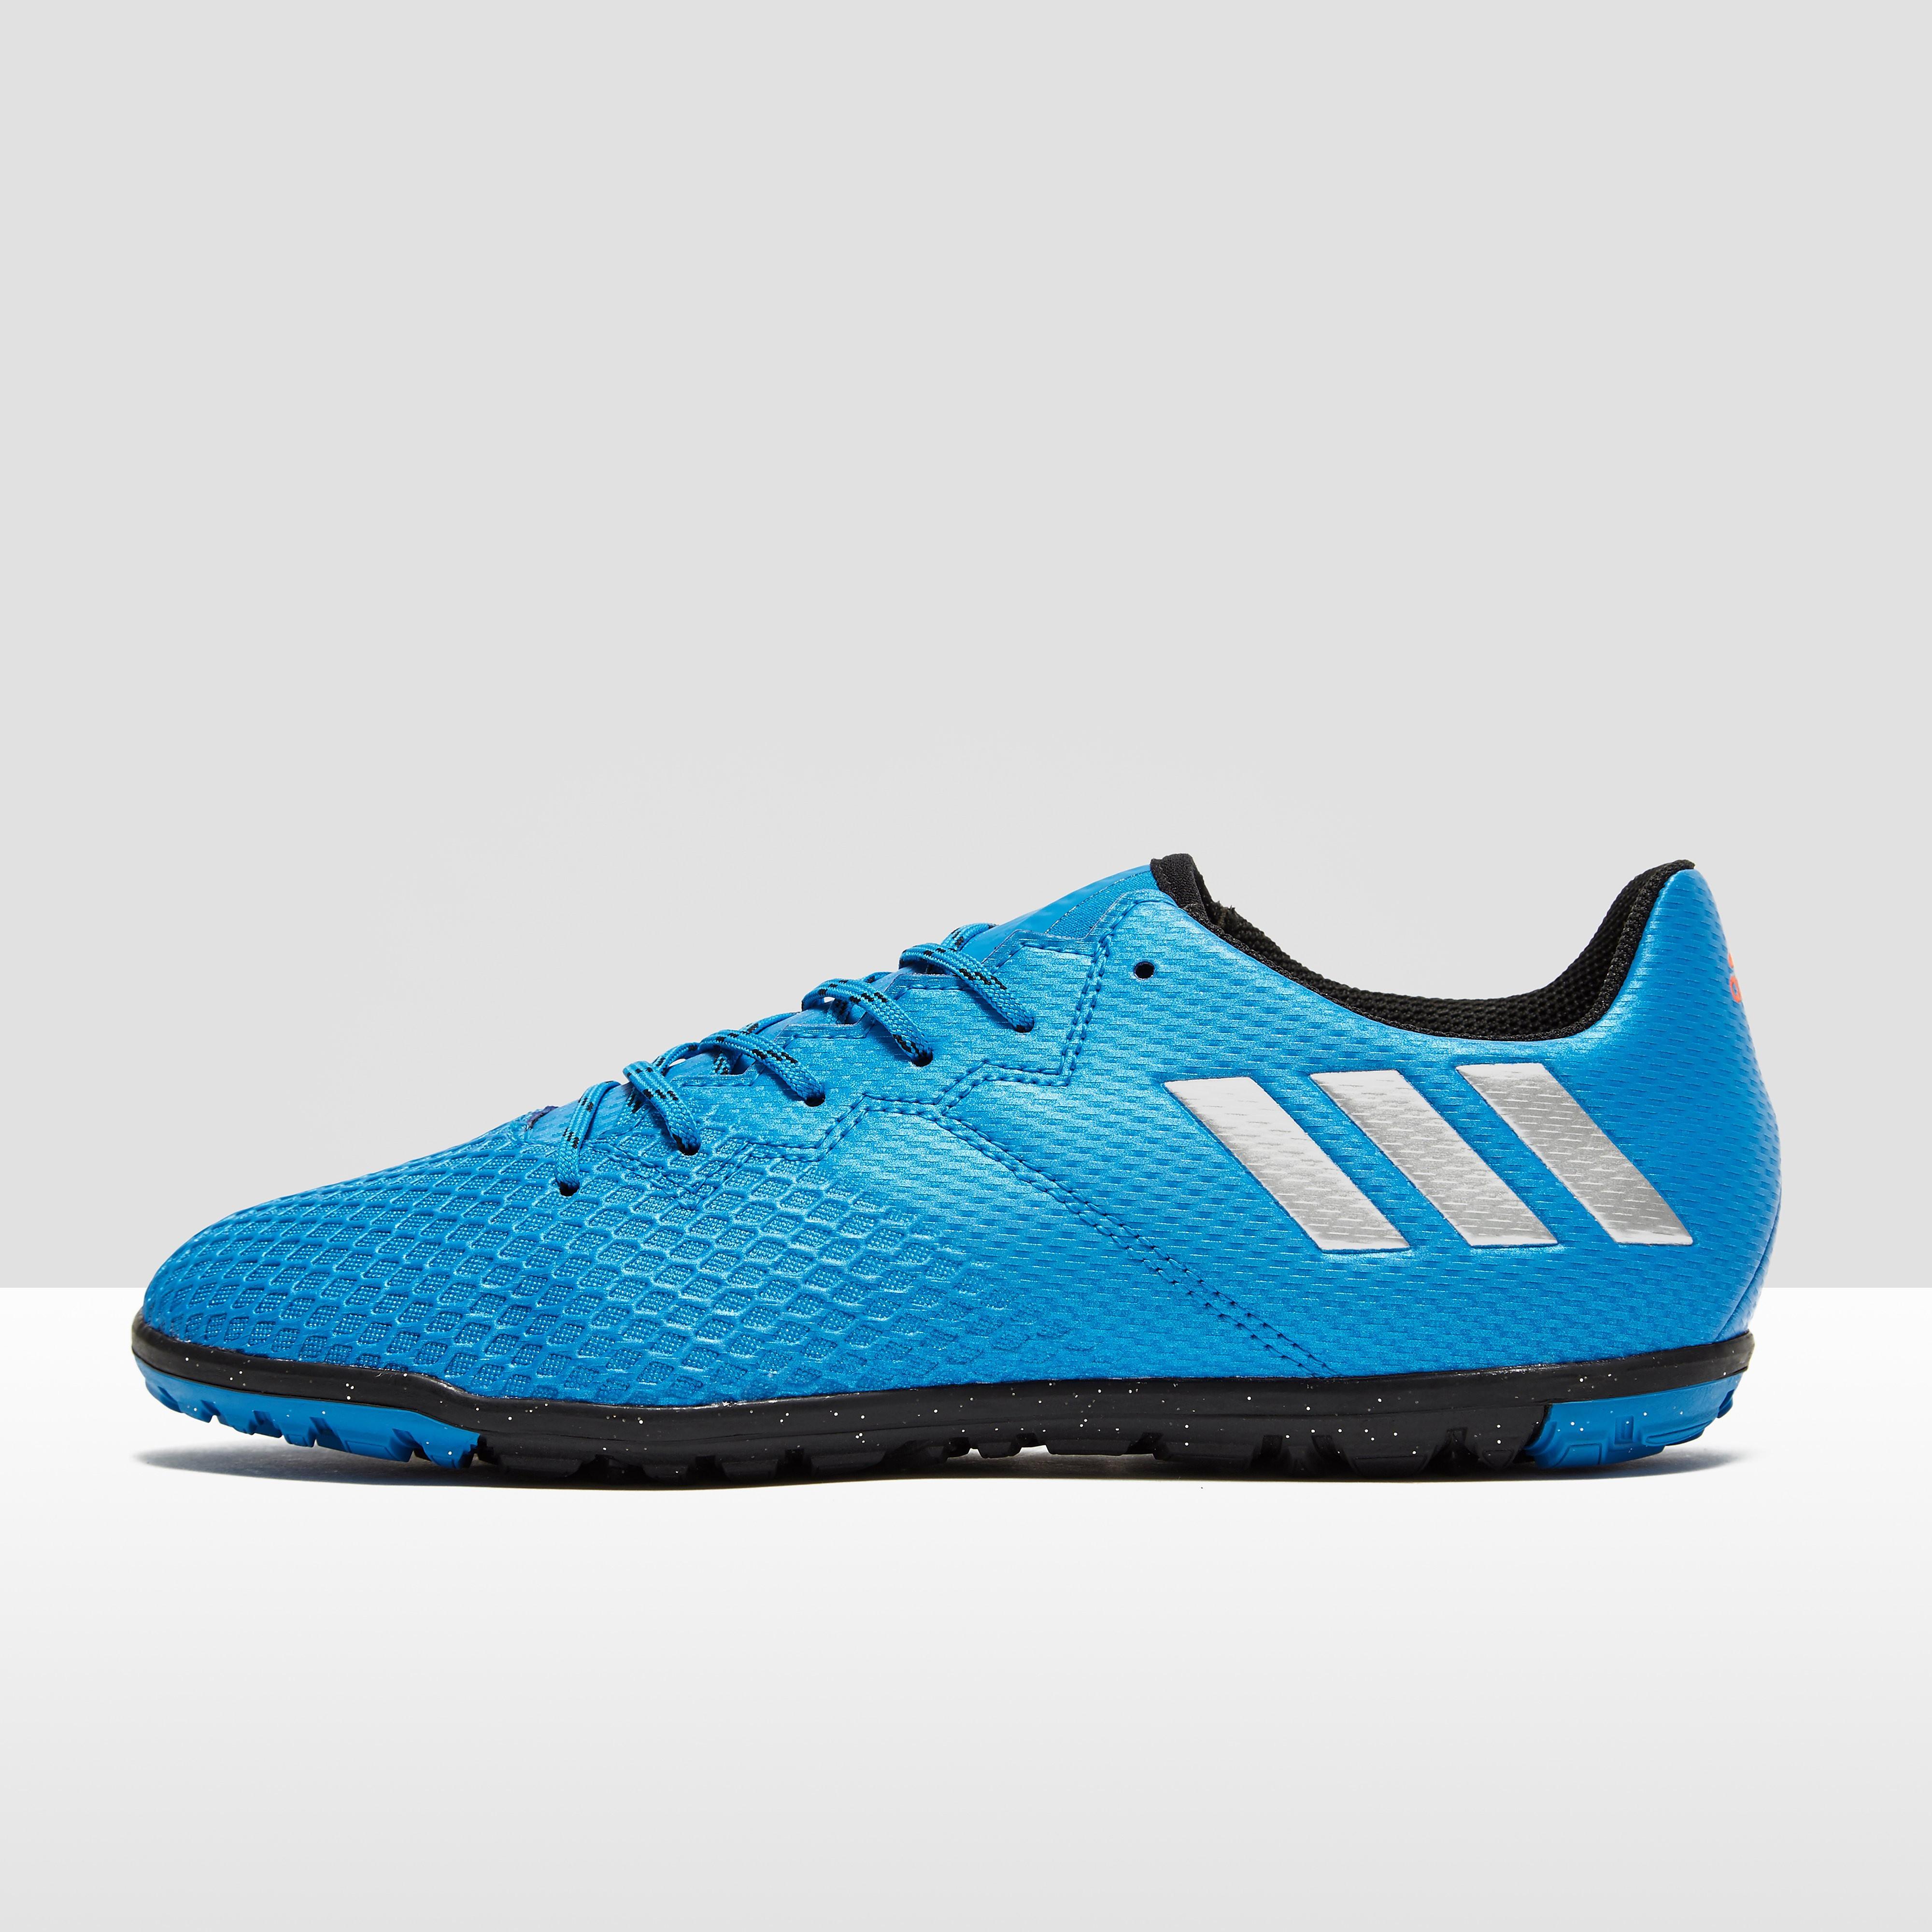 adidas Messi 16.3 Turf Football Boots Junior